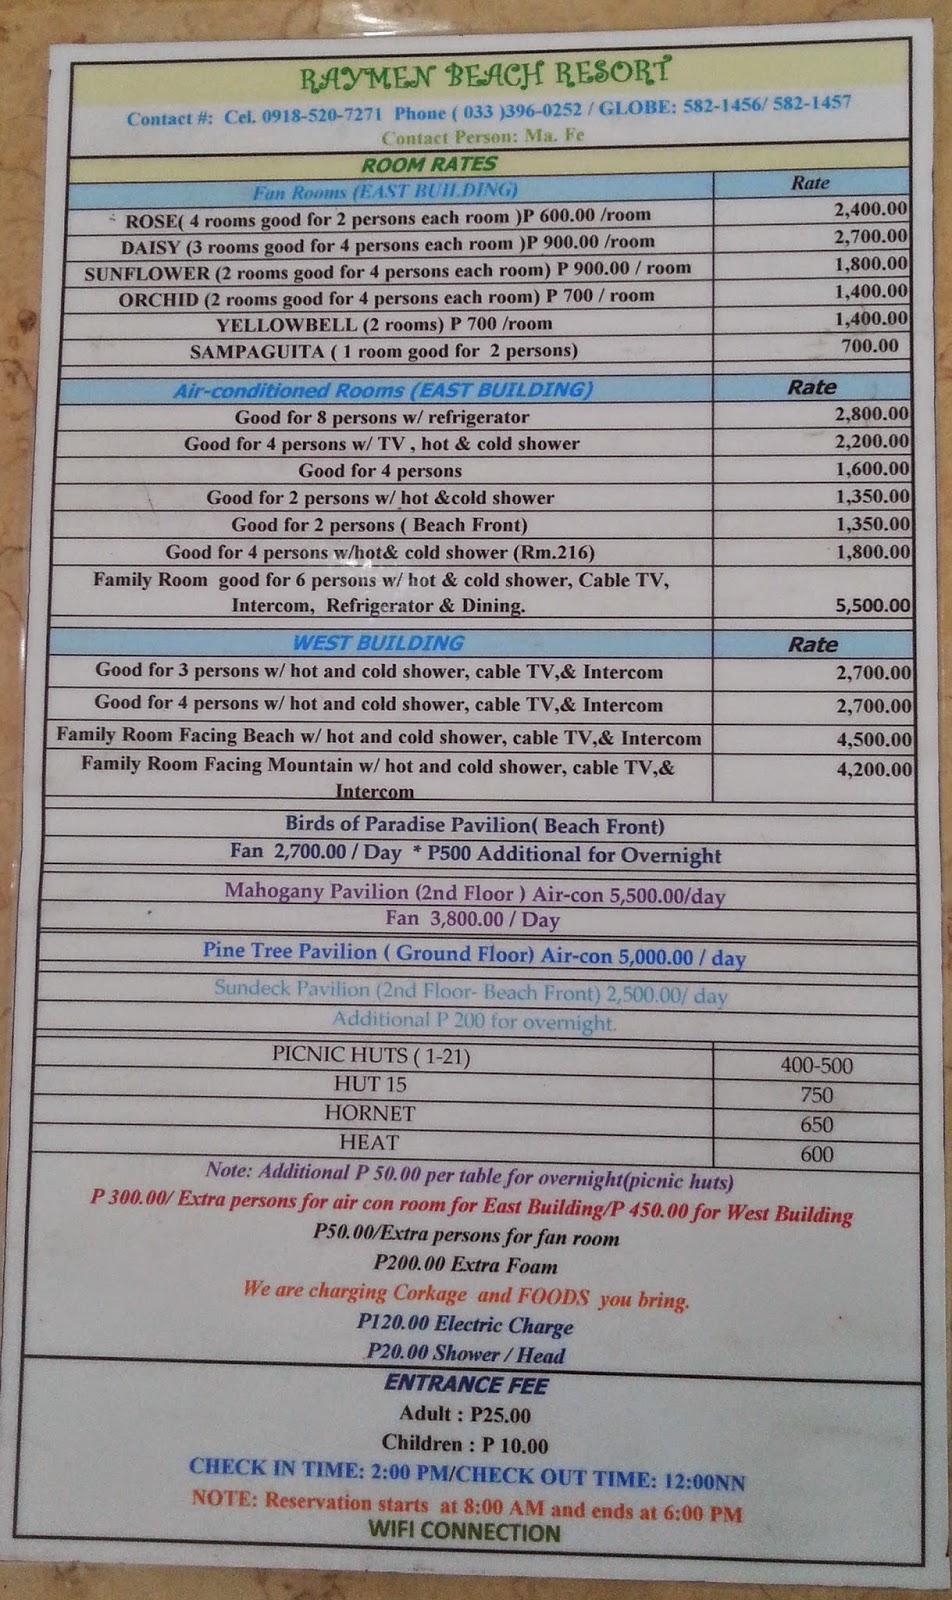 Raymen Beach Resort Room Rates